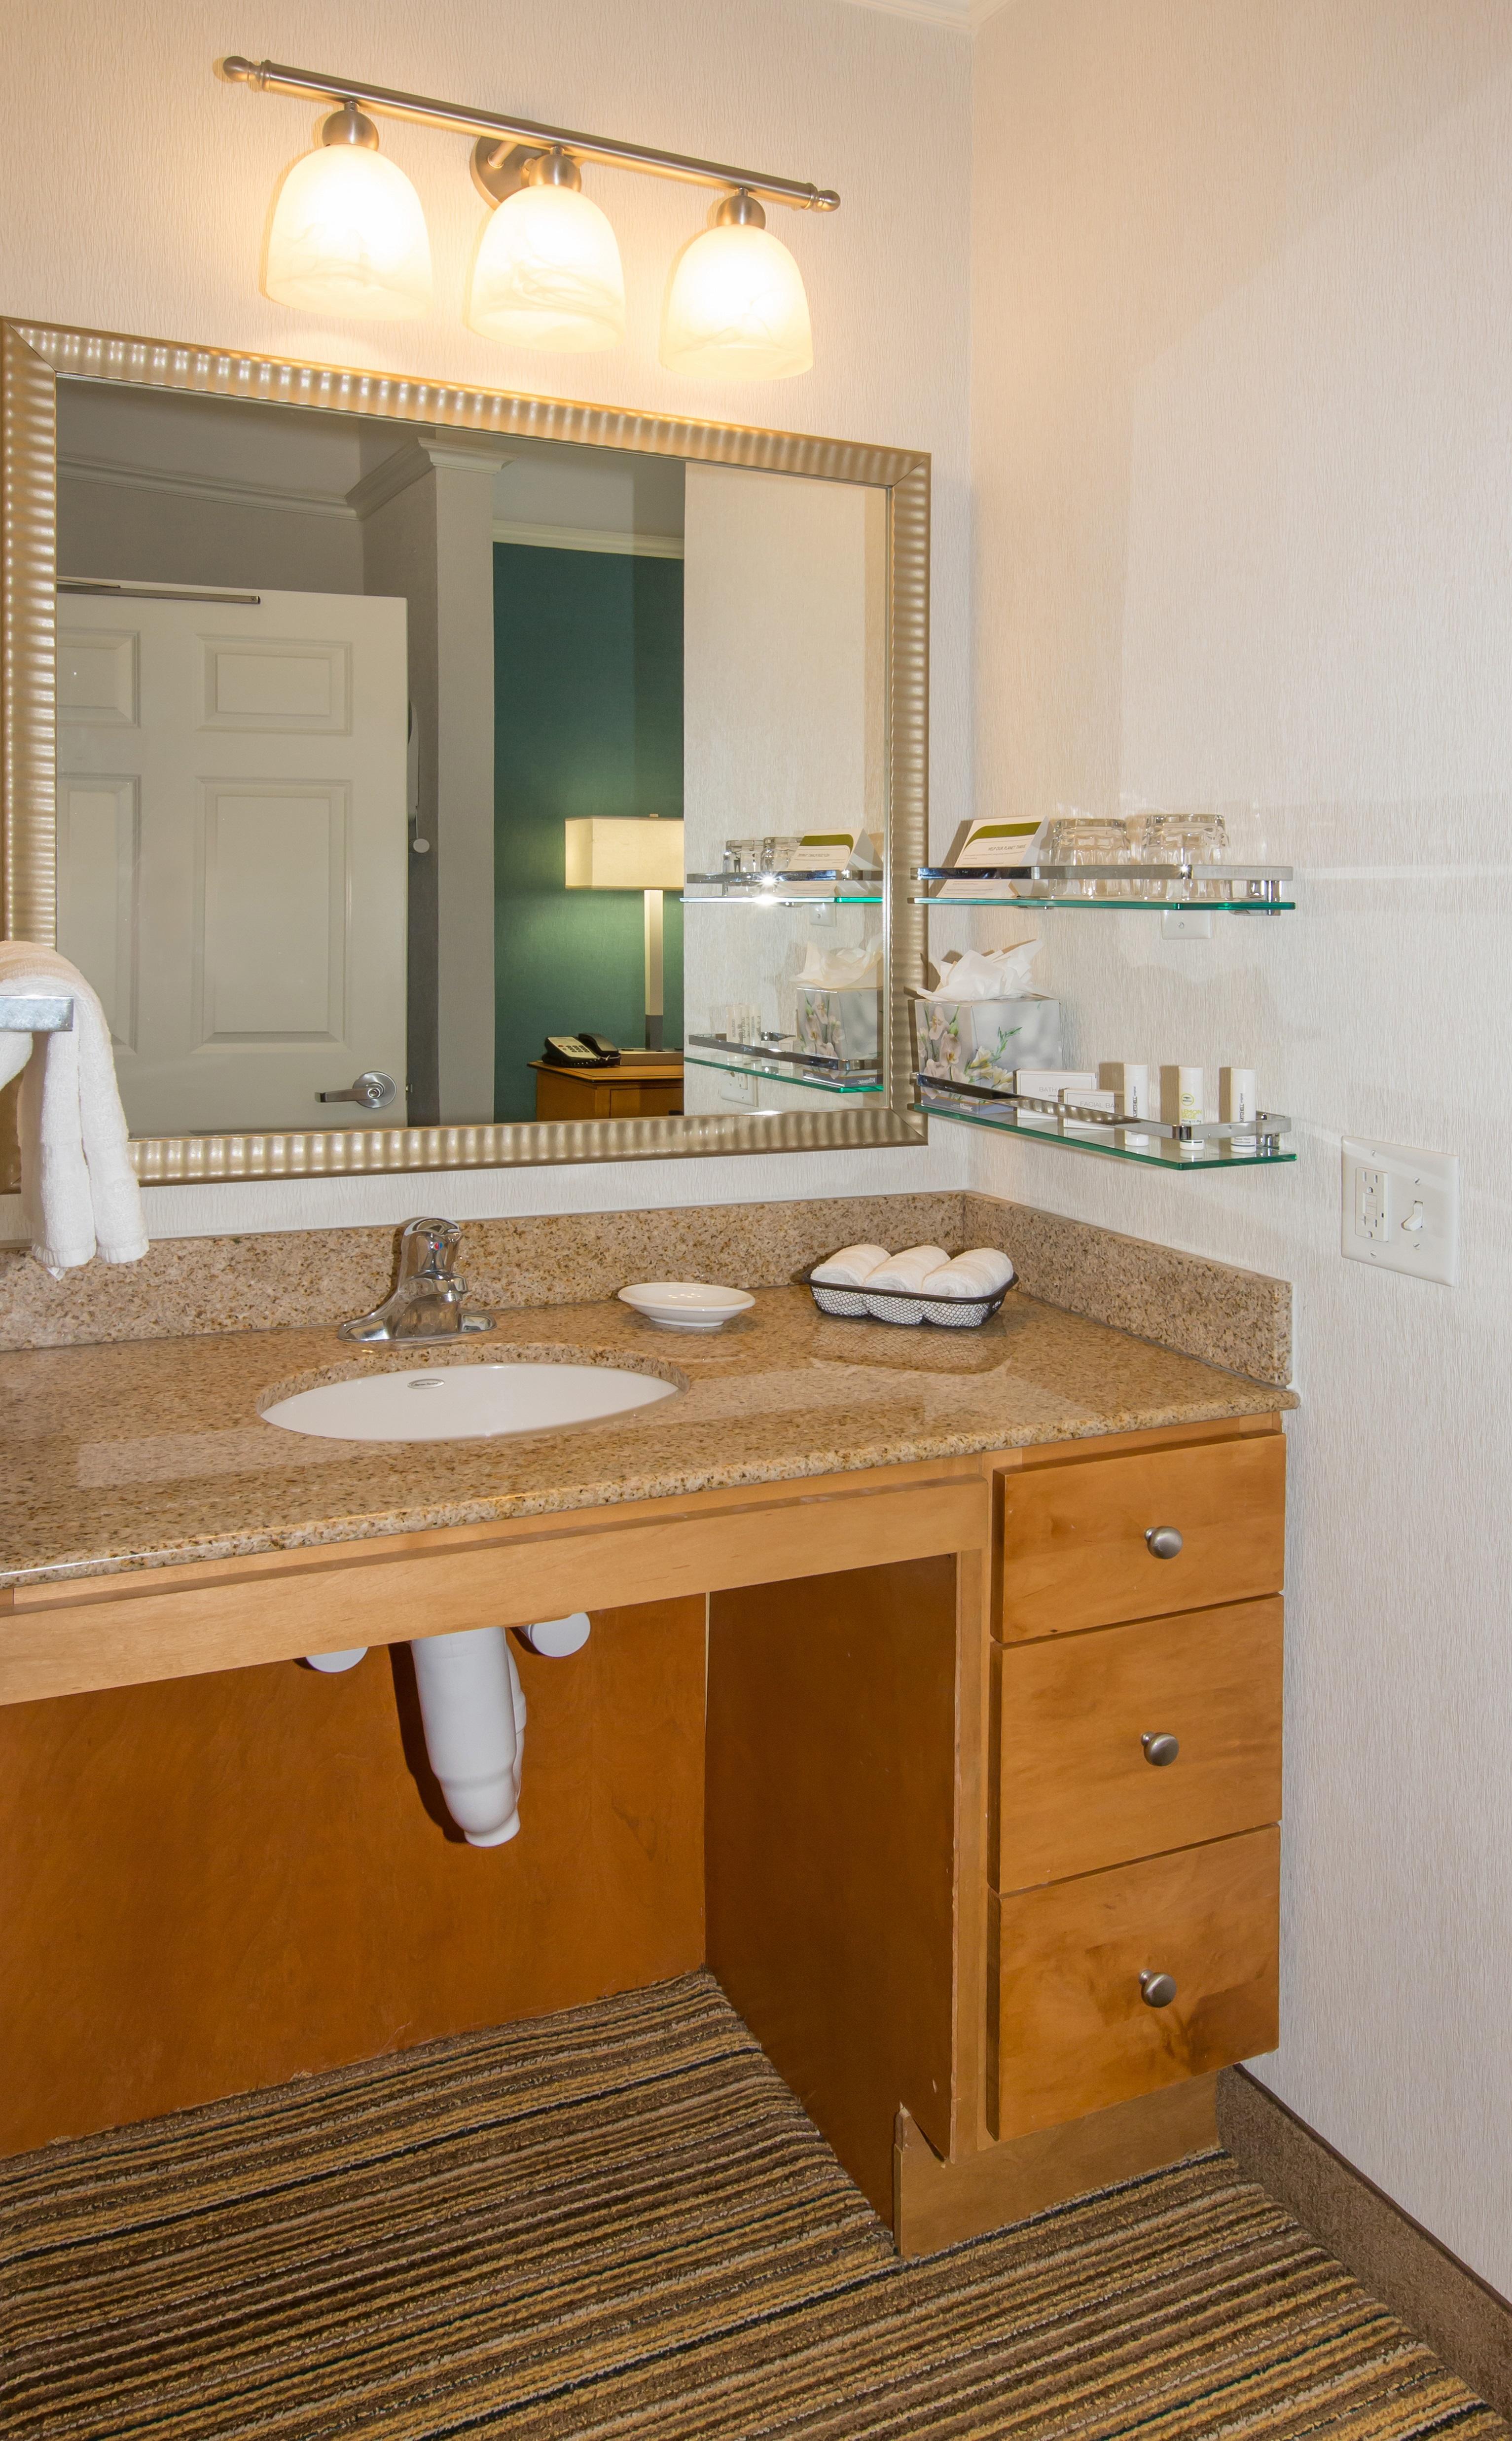 Wayne New Jersey Hotel Suites  Residence Inn Wayne Hotel